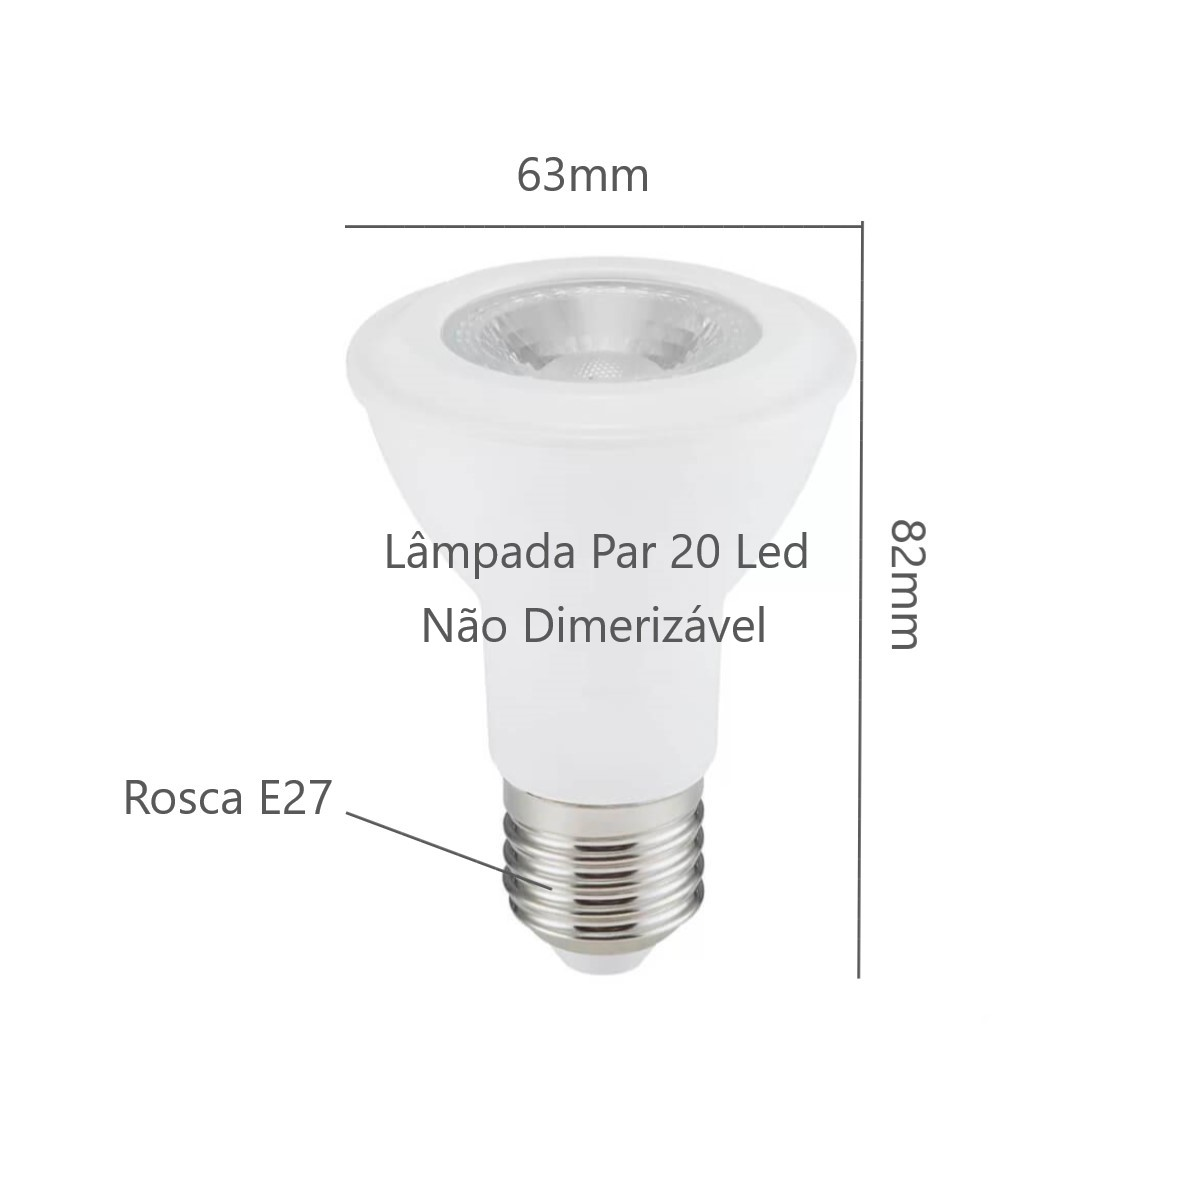 Kit Trilho Eletrificado 1m Branco Oko Nordecor + 3 Spot Par20 + Lâmp. Led Luz Quente